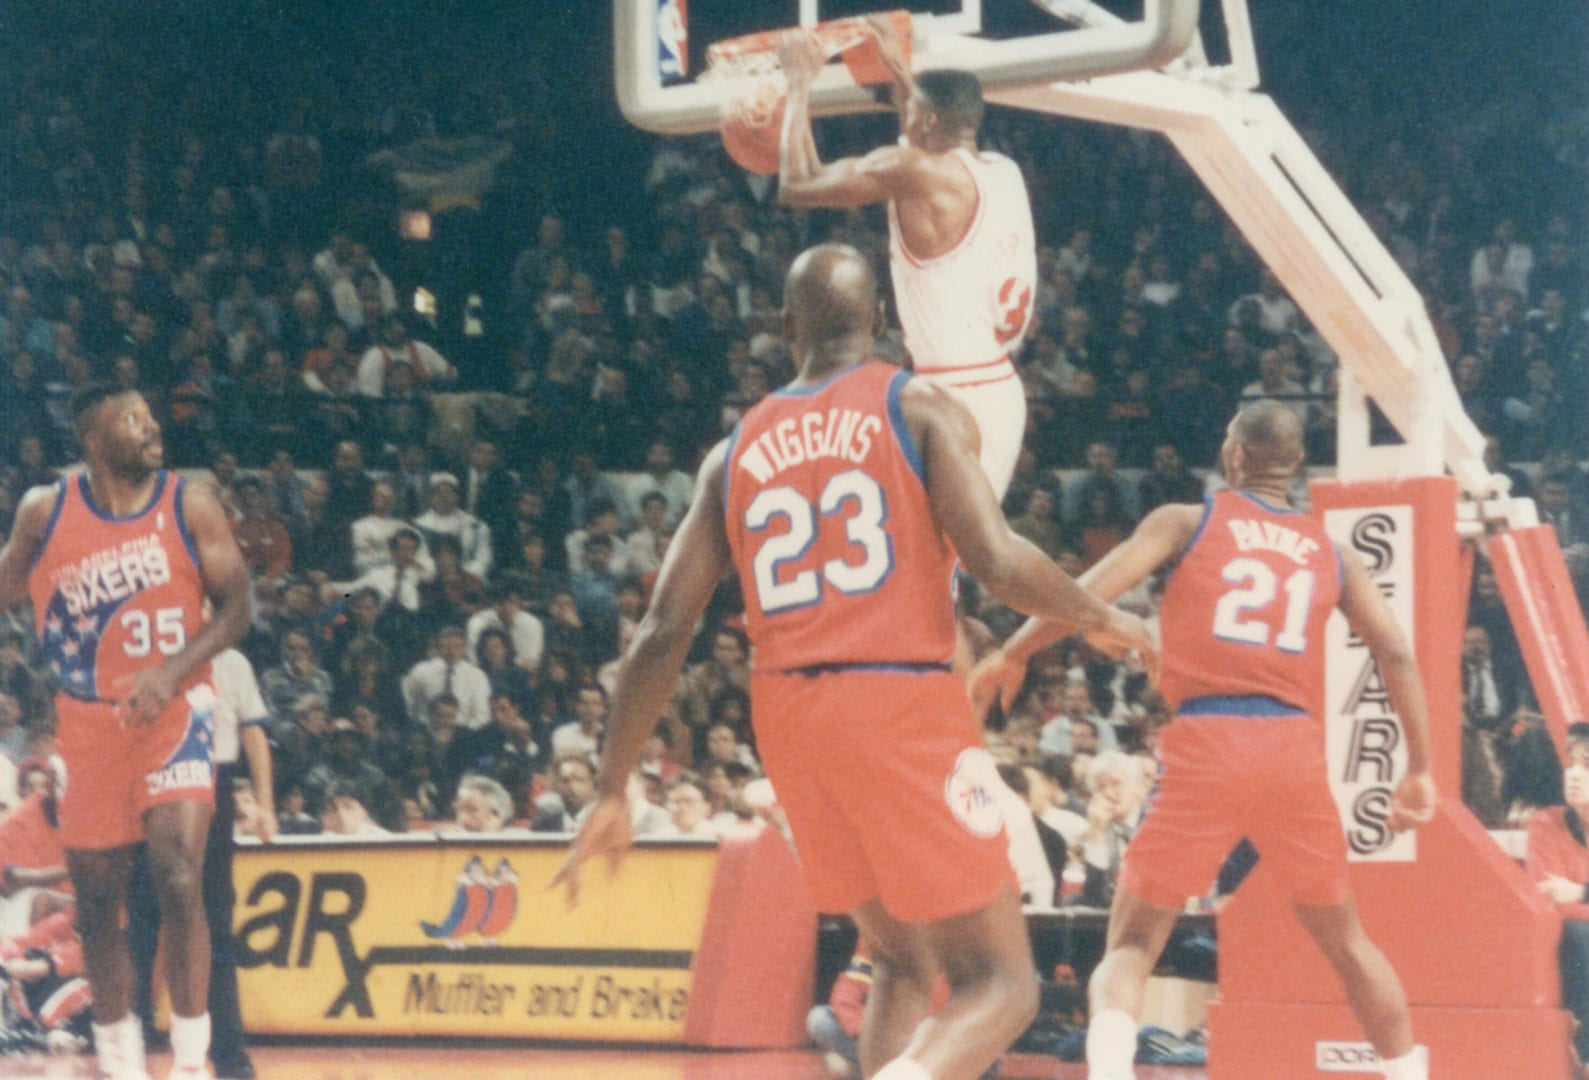 A dunk of Scottie Pippen